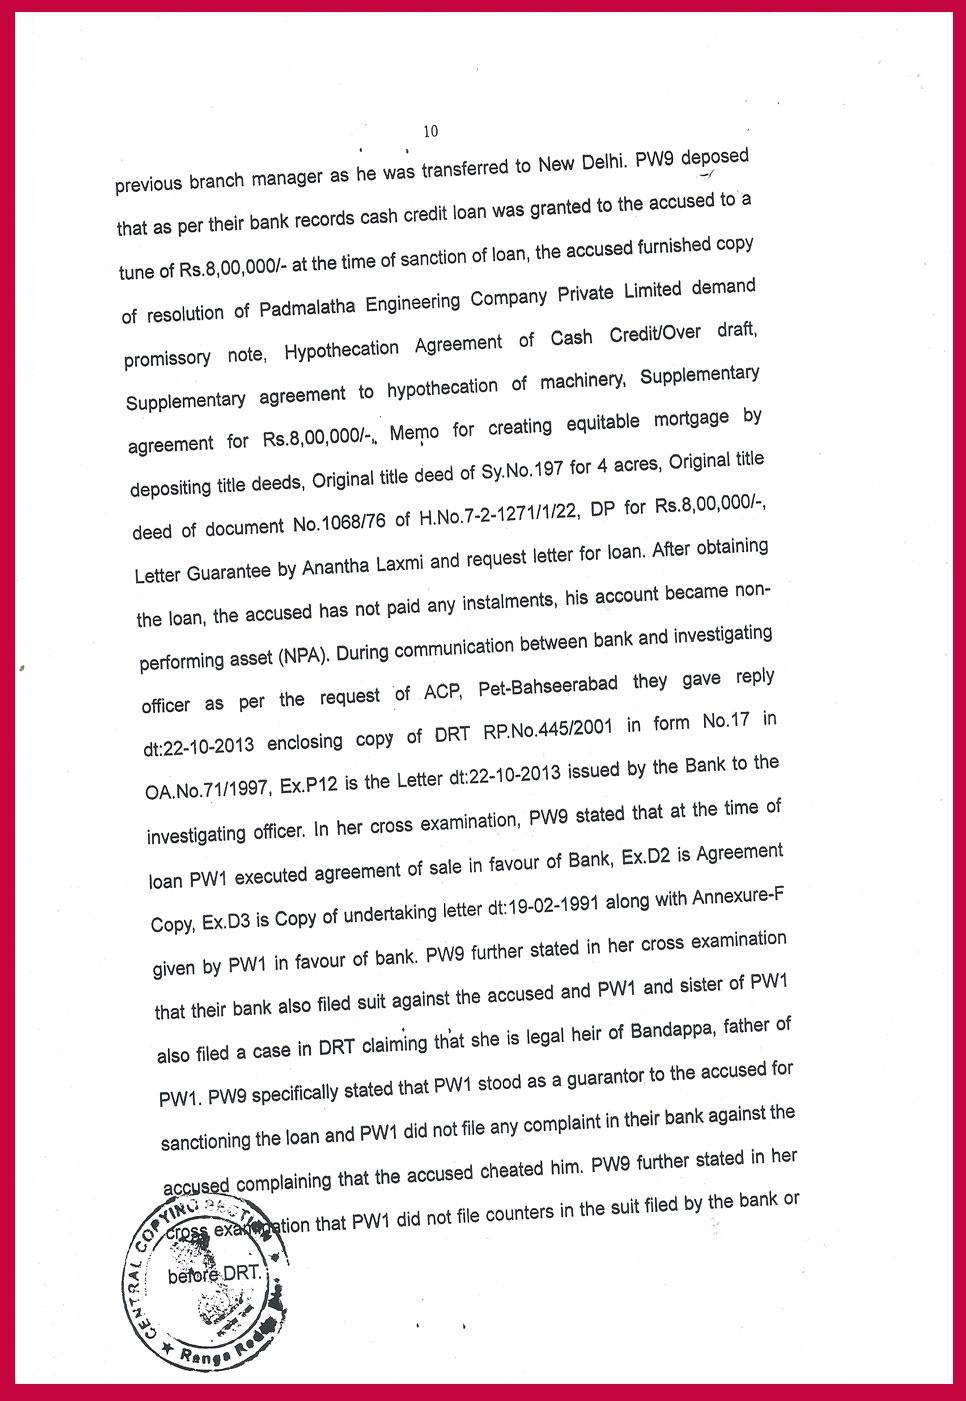 Ranga Reddy Court Judgment period 294 days-10